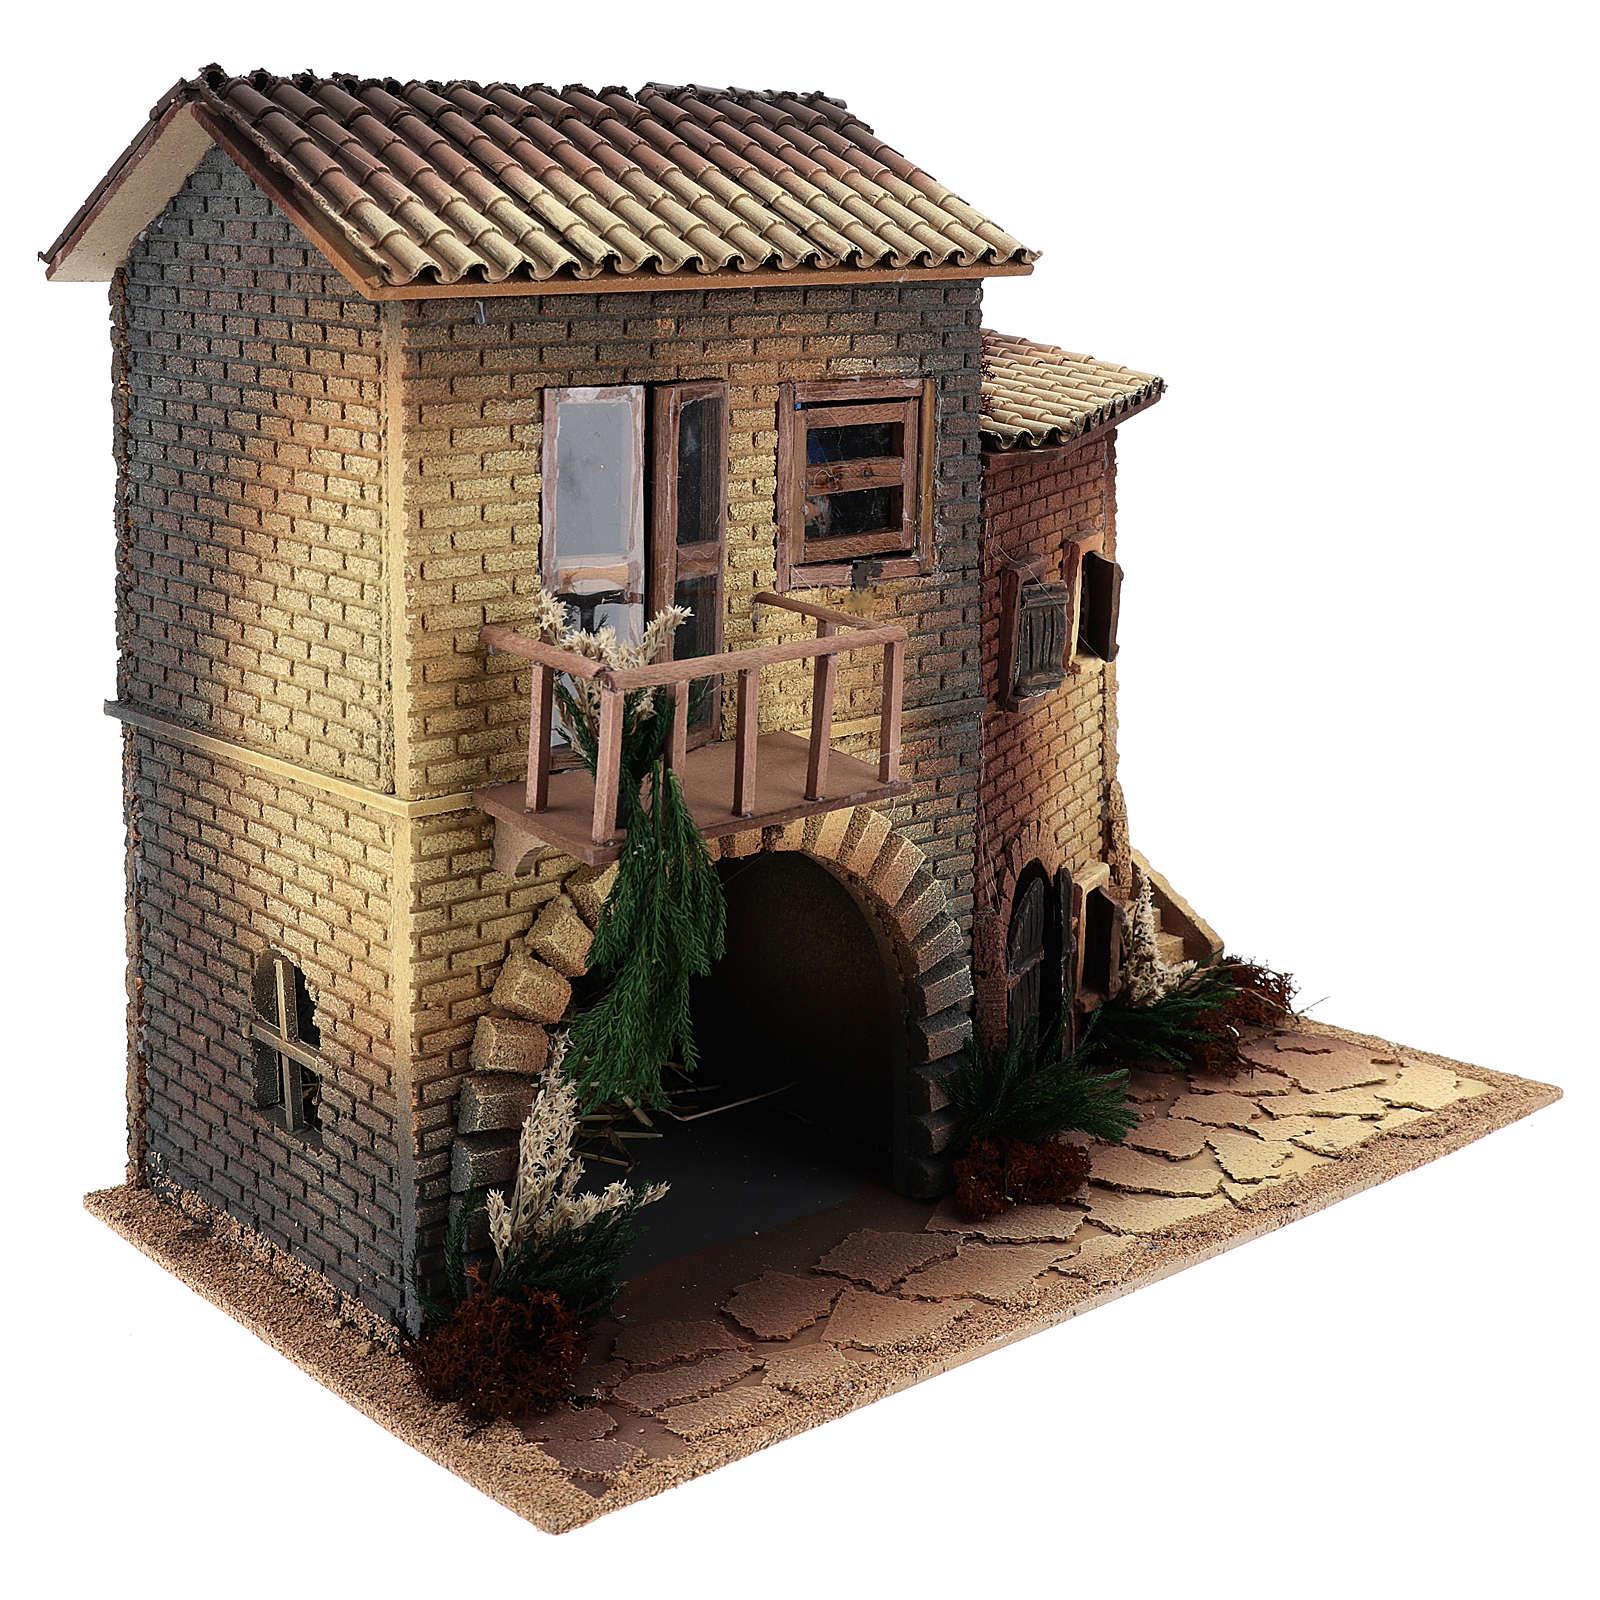 Casa con mujer que abre ventana 45x50x30 cm movimiento belén 12 cm 3